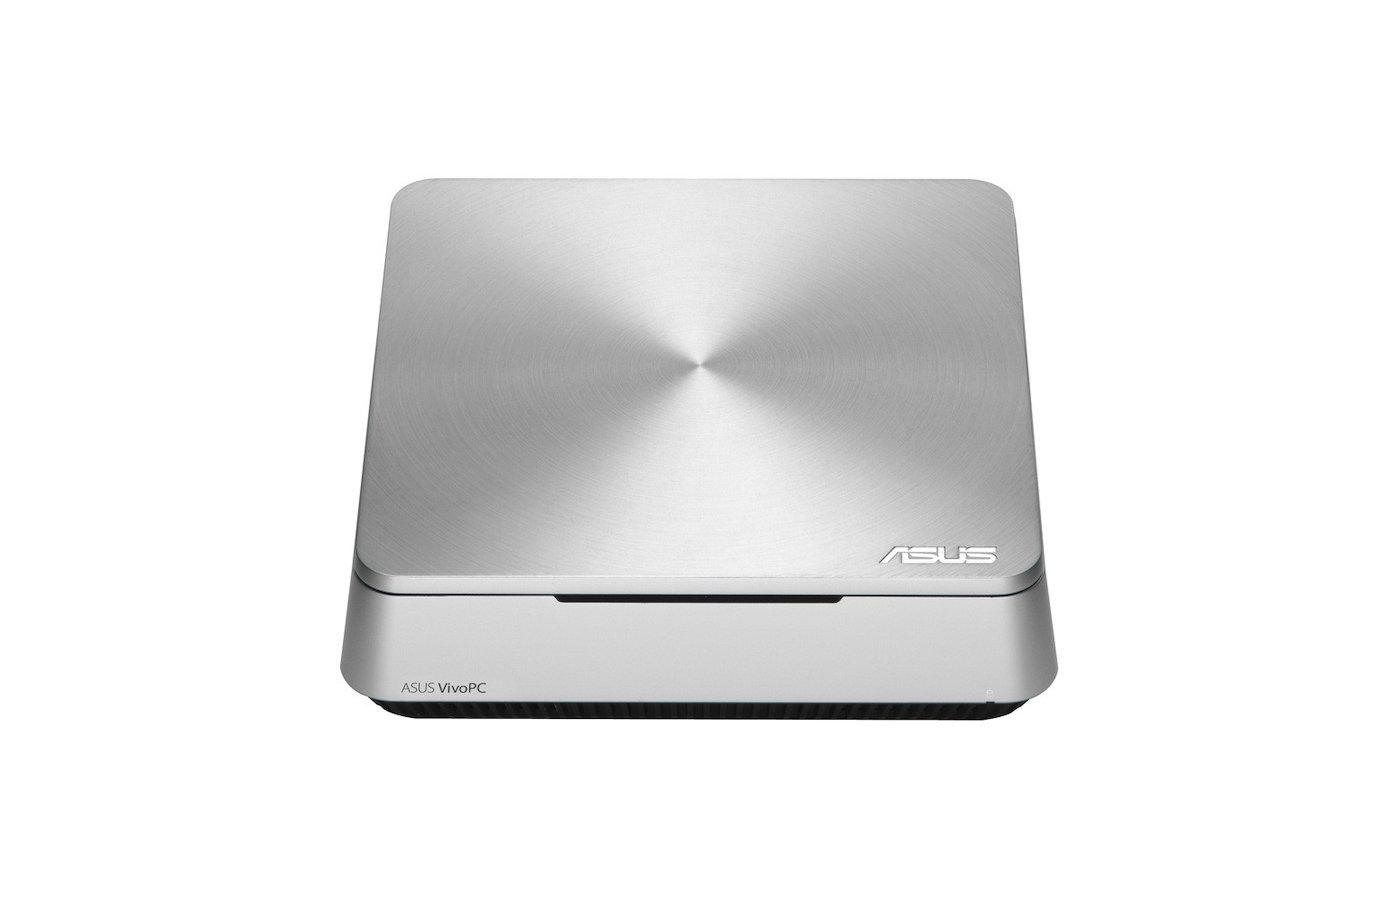 Системный блок Asus VivoPC VM42-S031M /90MS00B1-M00310/ intel 2957U/4Gb/500Gb/DOS